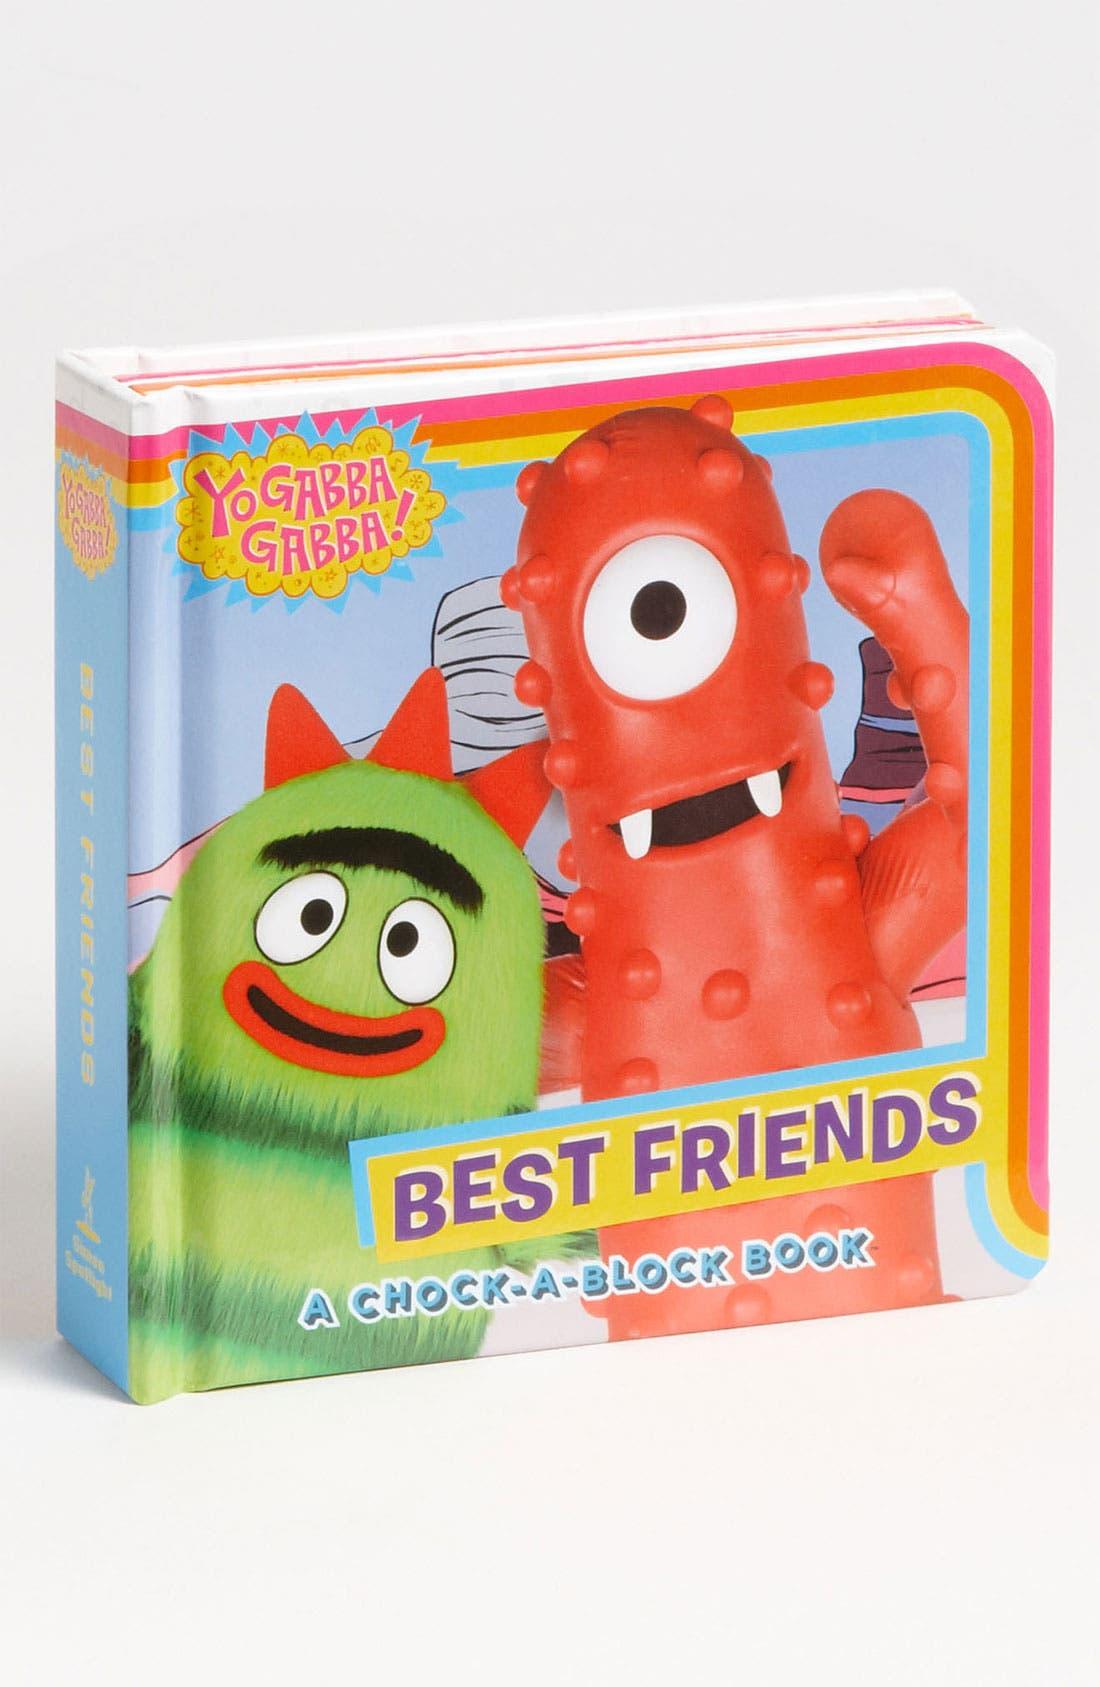 Alternate Image 1 Selected - Ellie Seiss 'Yo Gabba Gabba!™ - Best Friends' Book